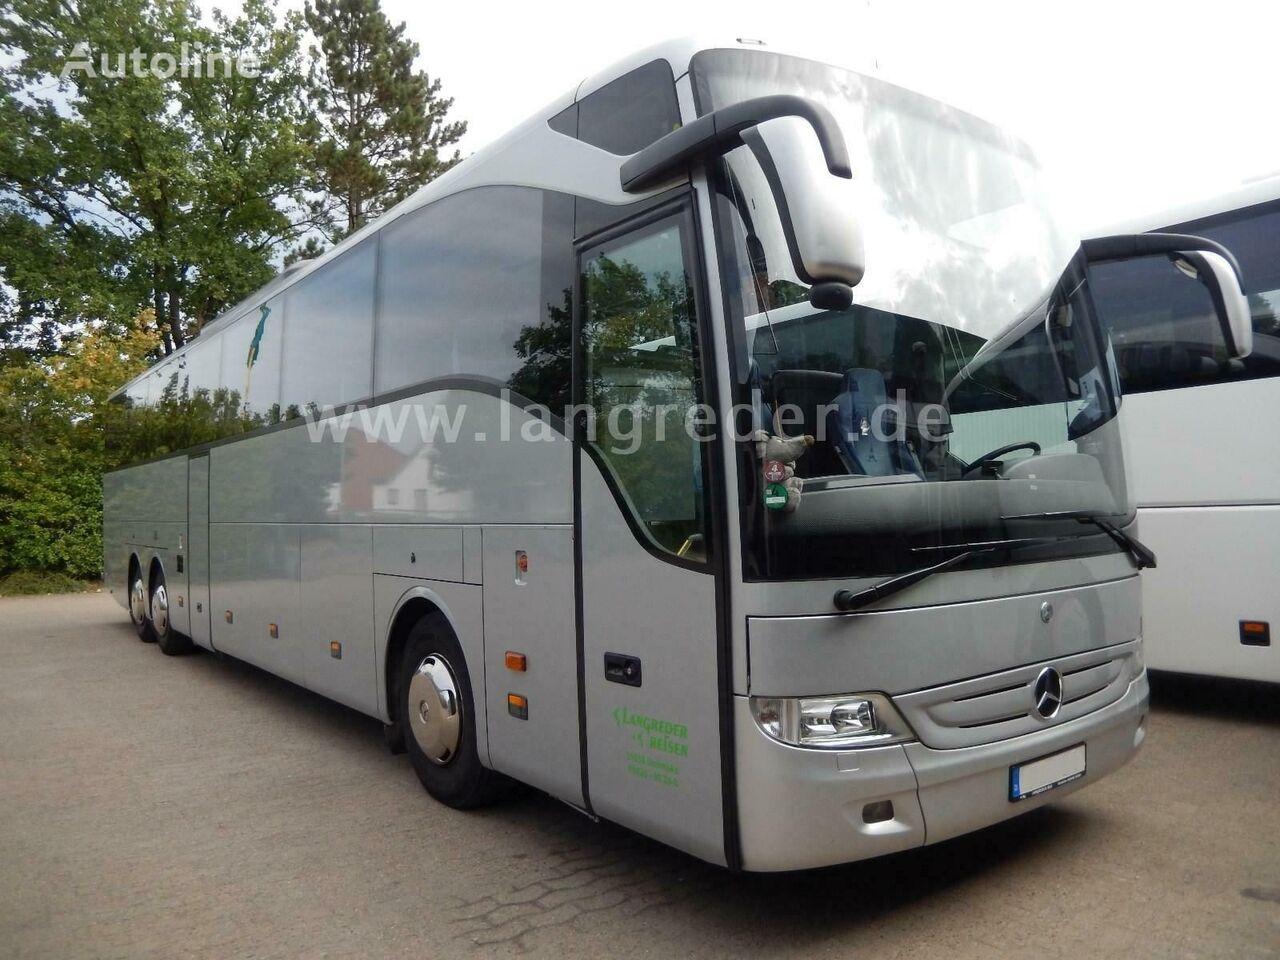 MERCEDES-BENZ Tourismo RHD-L tur otobüsü